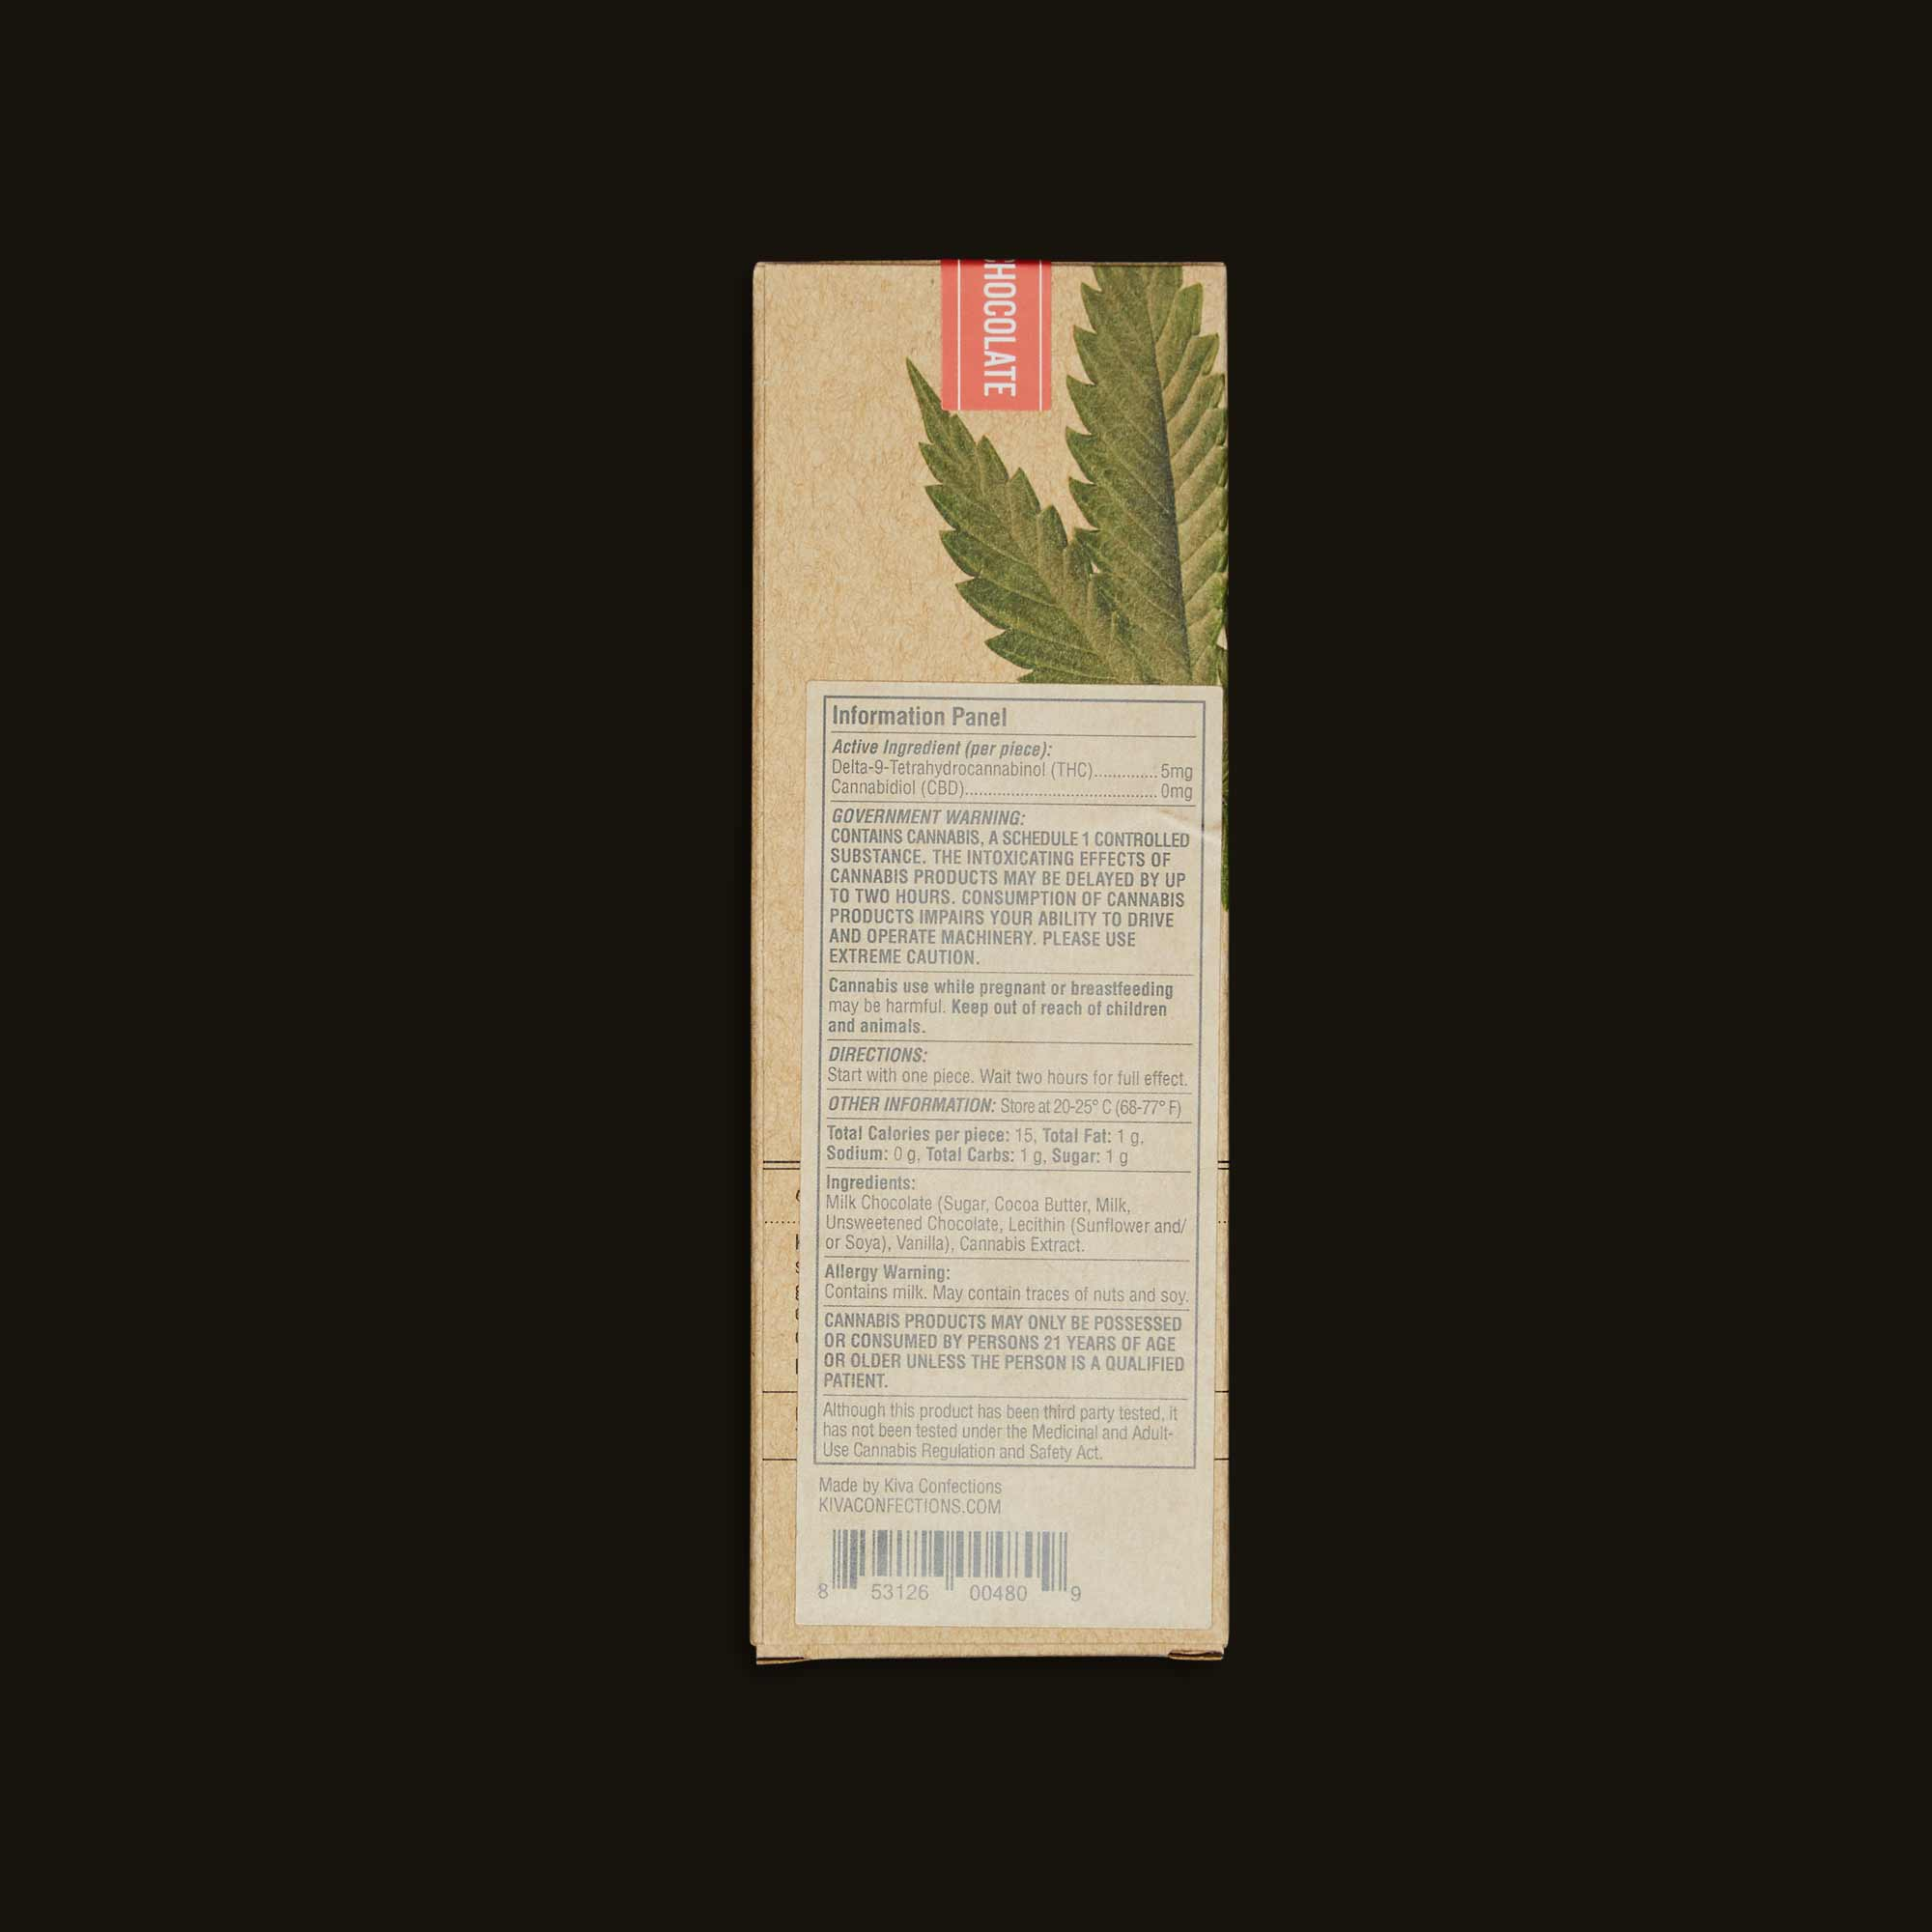 Kiva Milk Chocolate Bar Label and Ingredients